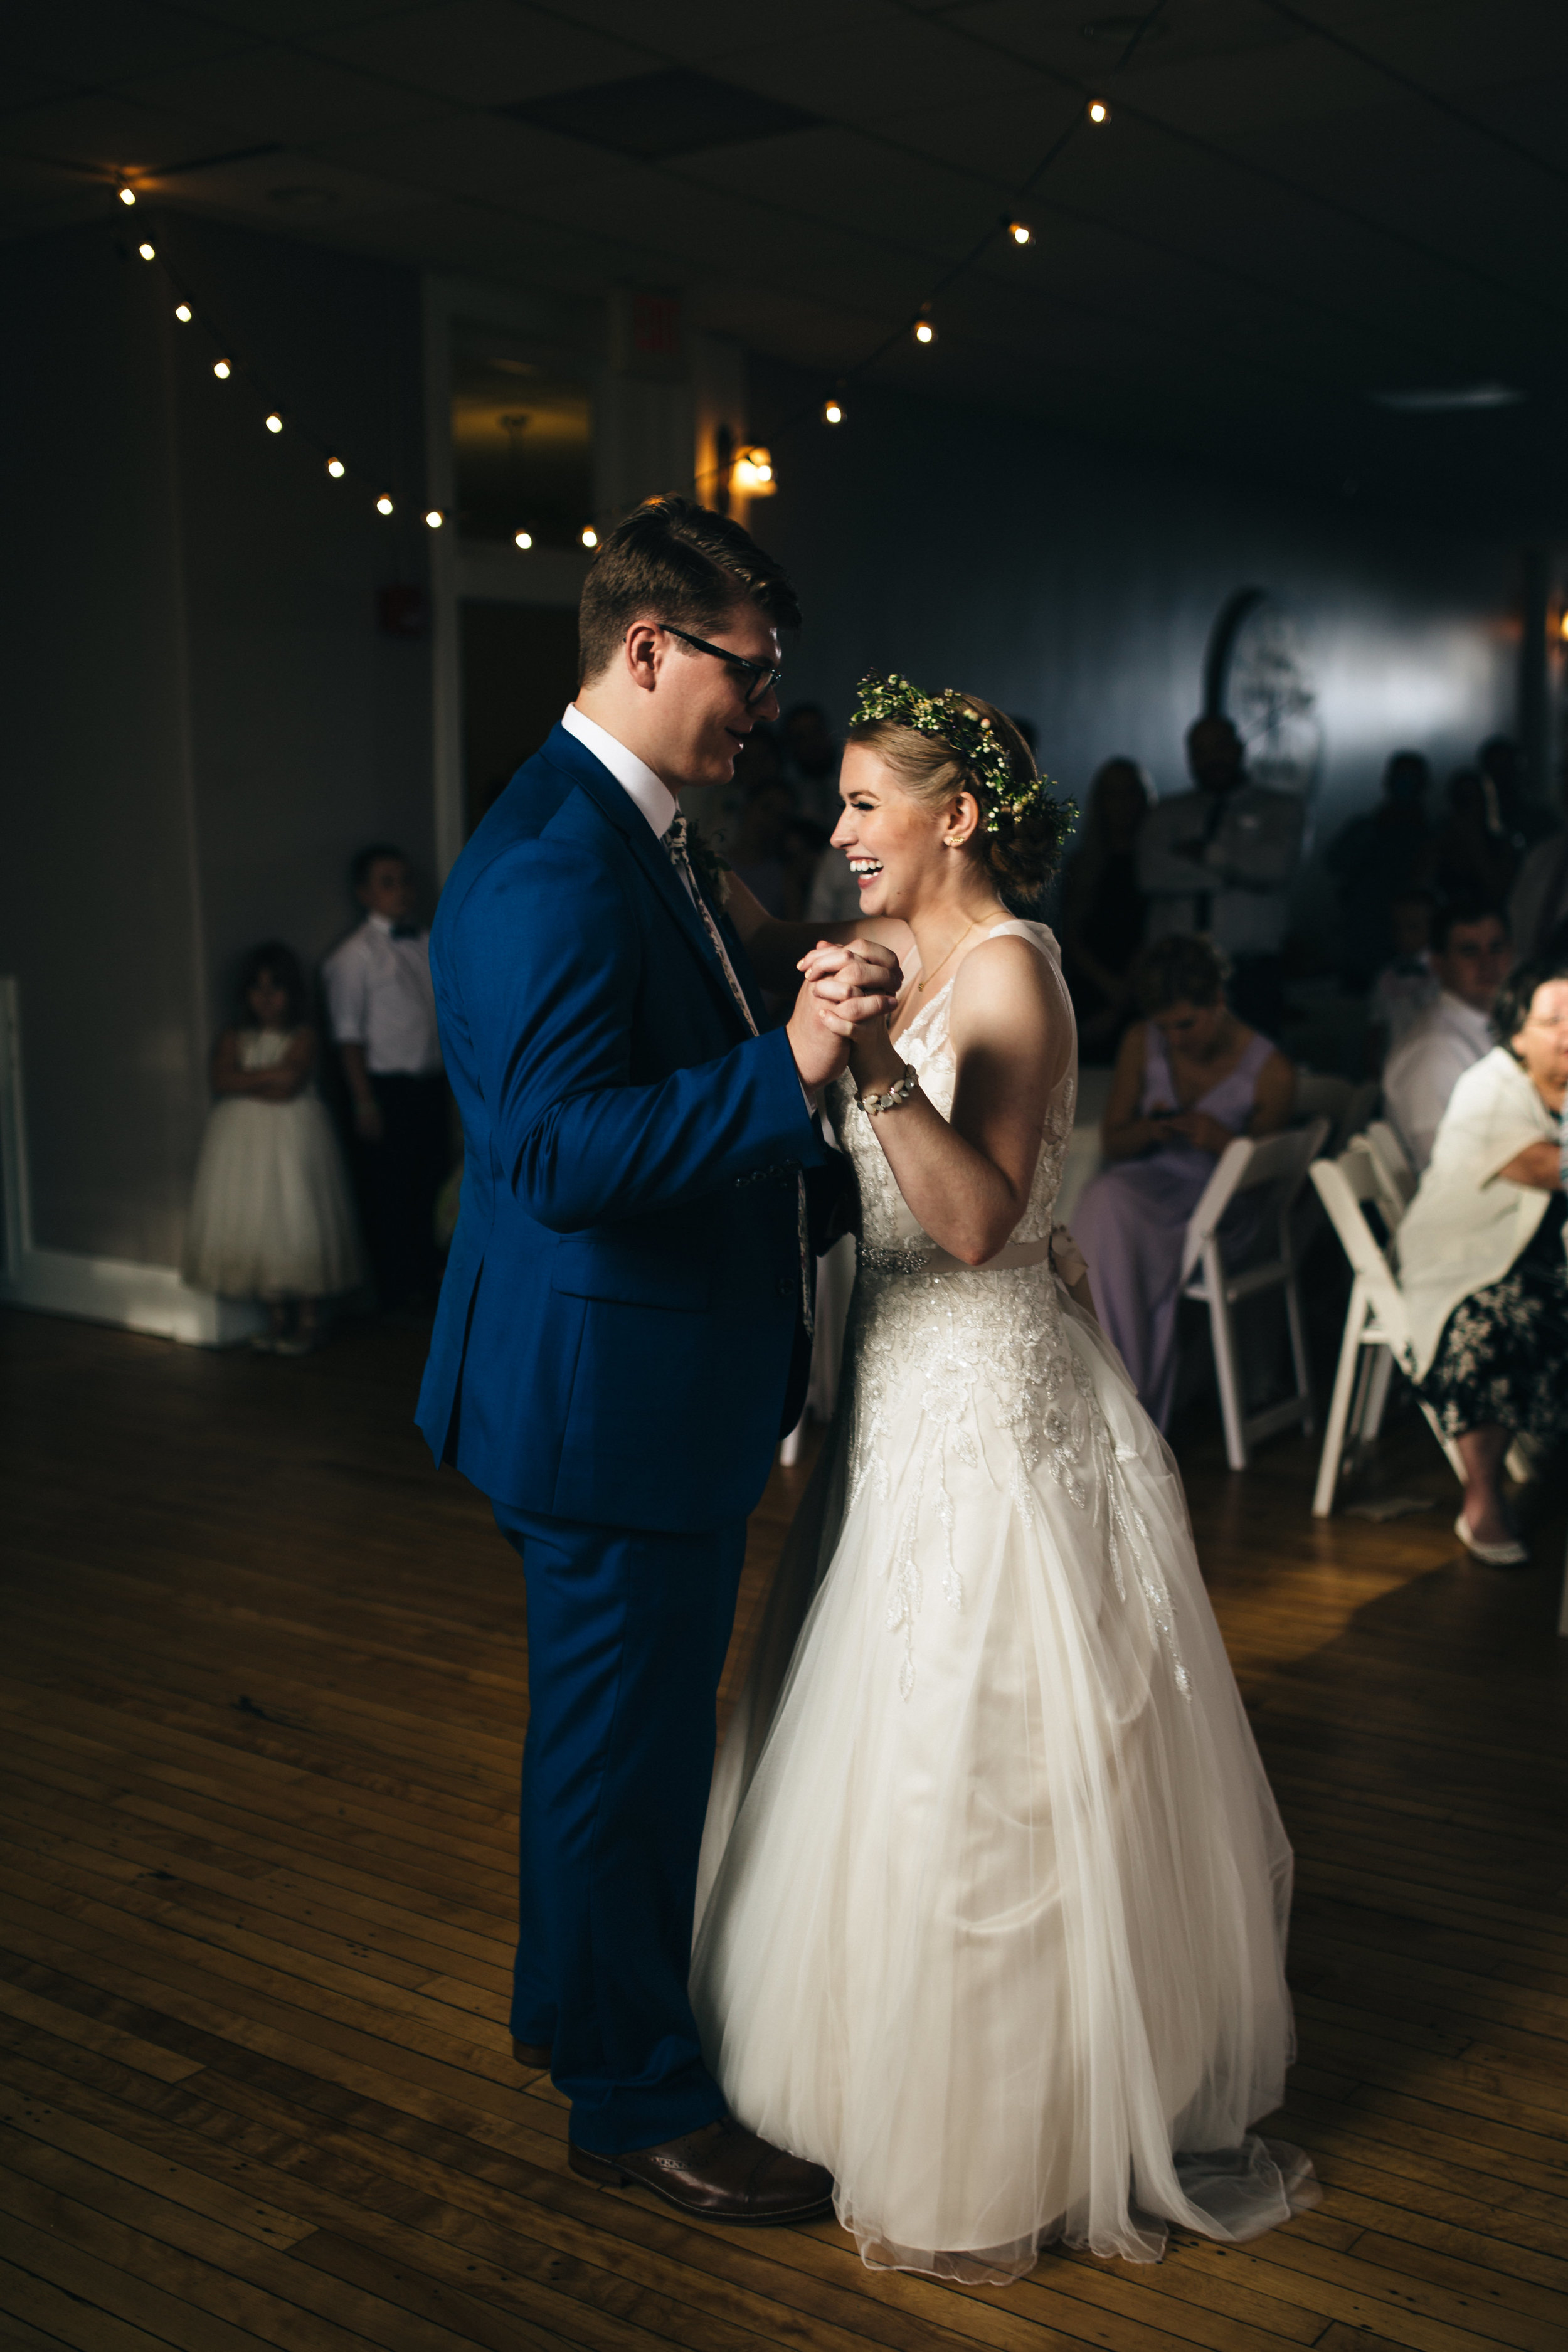 Beautiful first dance between bride and groom.